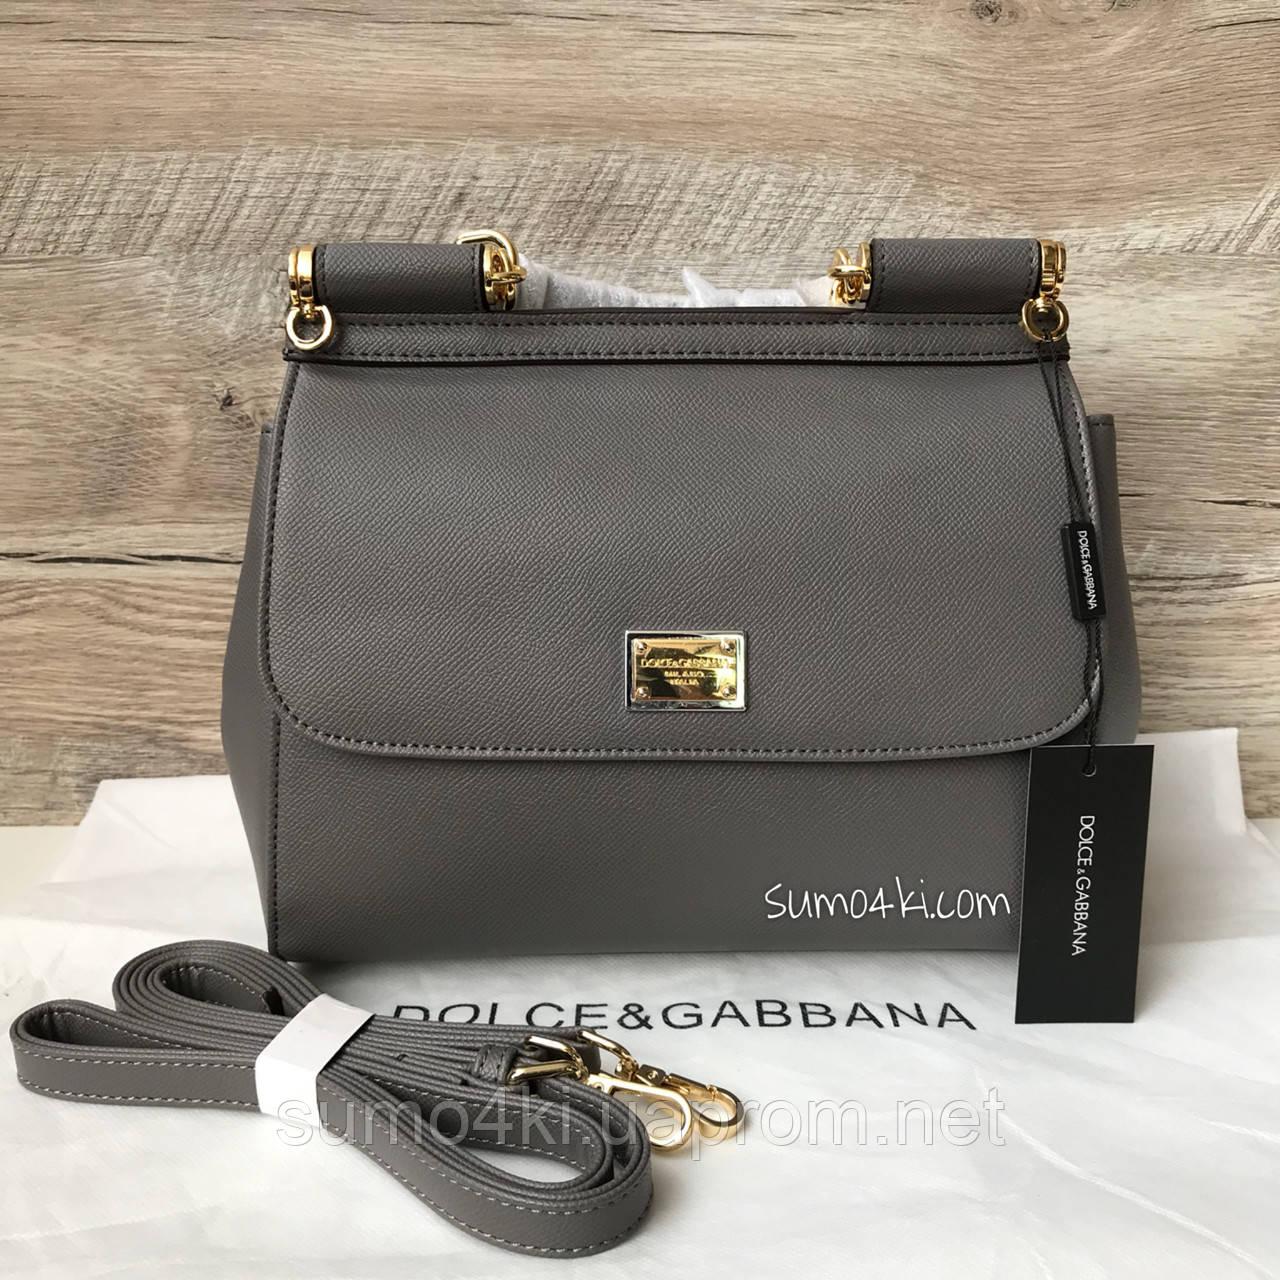 fb868dba6d3f Женская сумка Dolce & Gabbana Miss Sicily mini D&G - Интернет-магазин  «Галерея Сумок